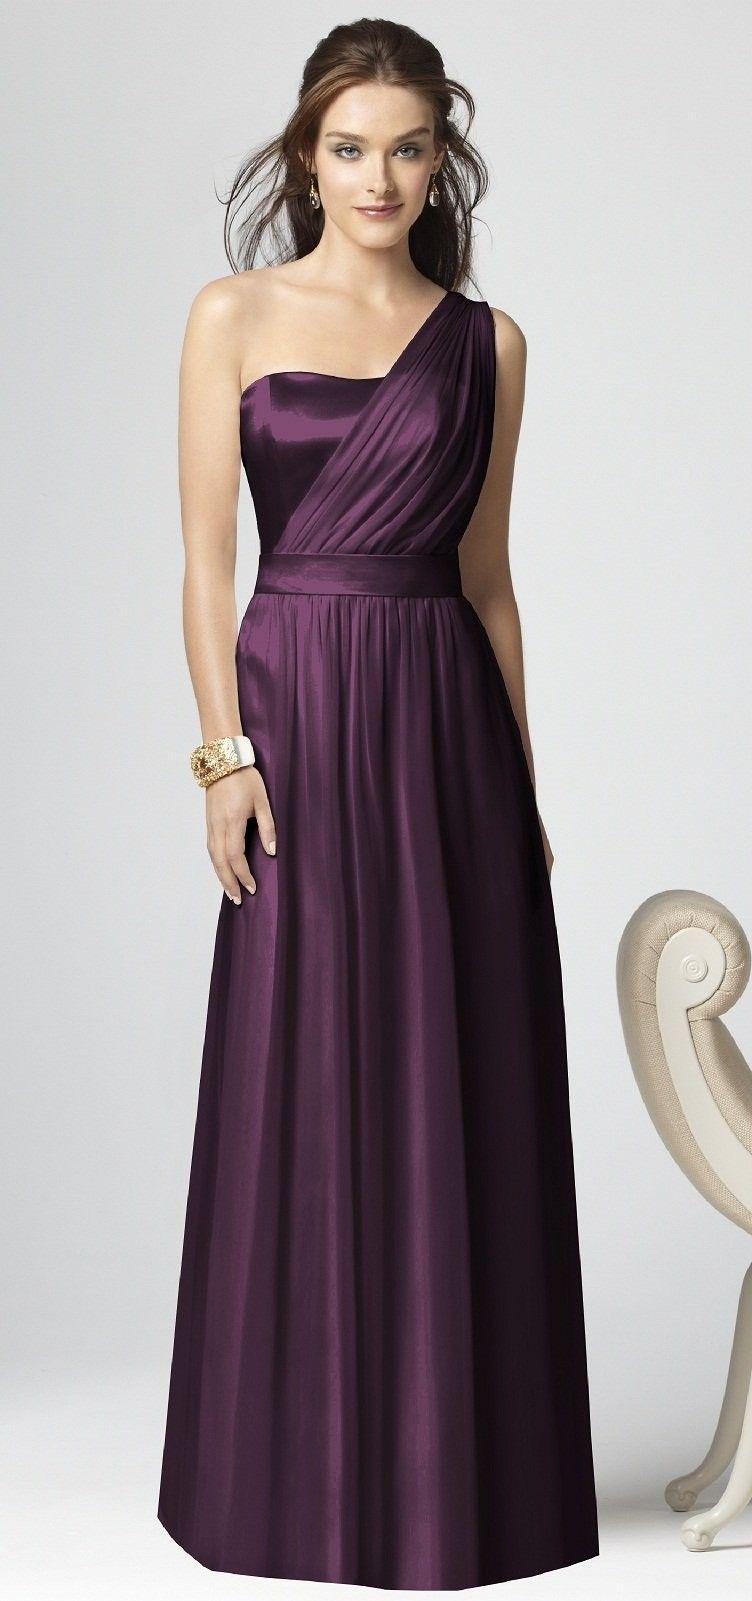 Pin by rose janosko on my style pinterest dress ideas weddings